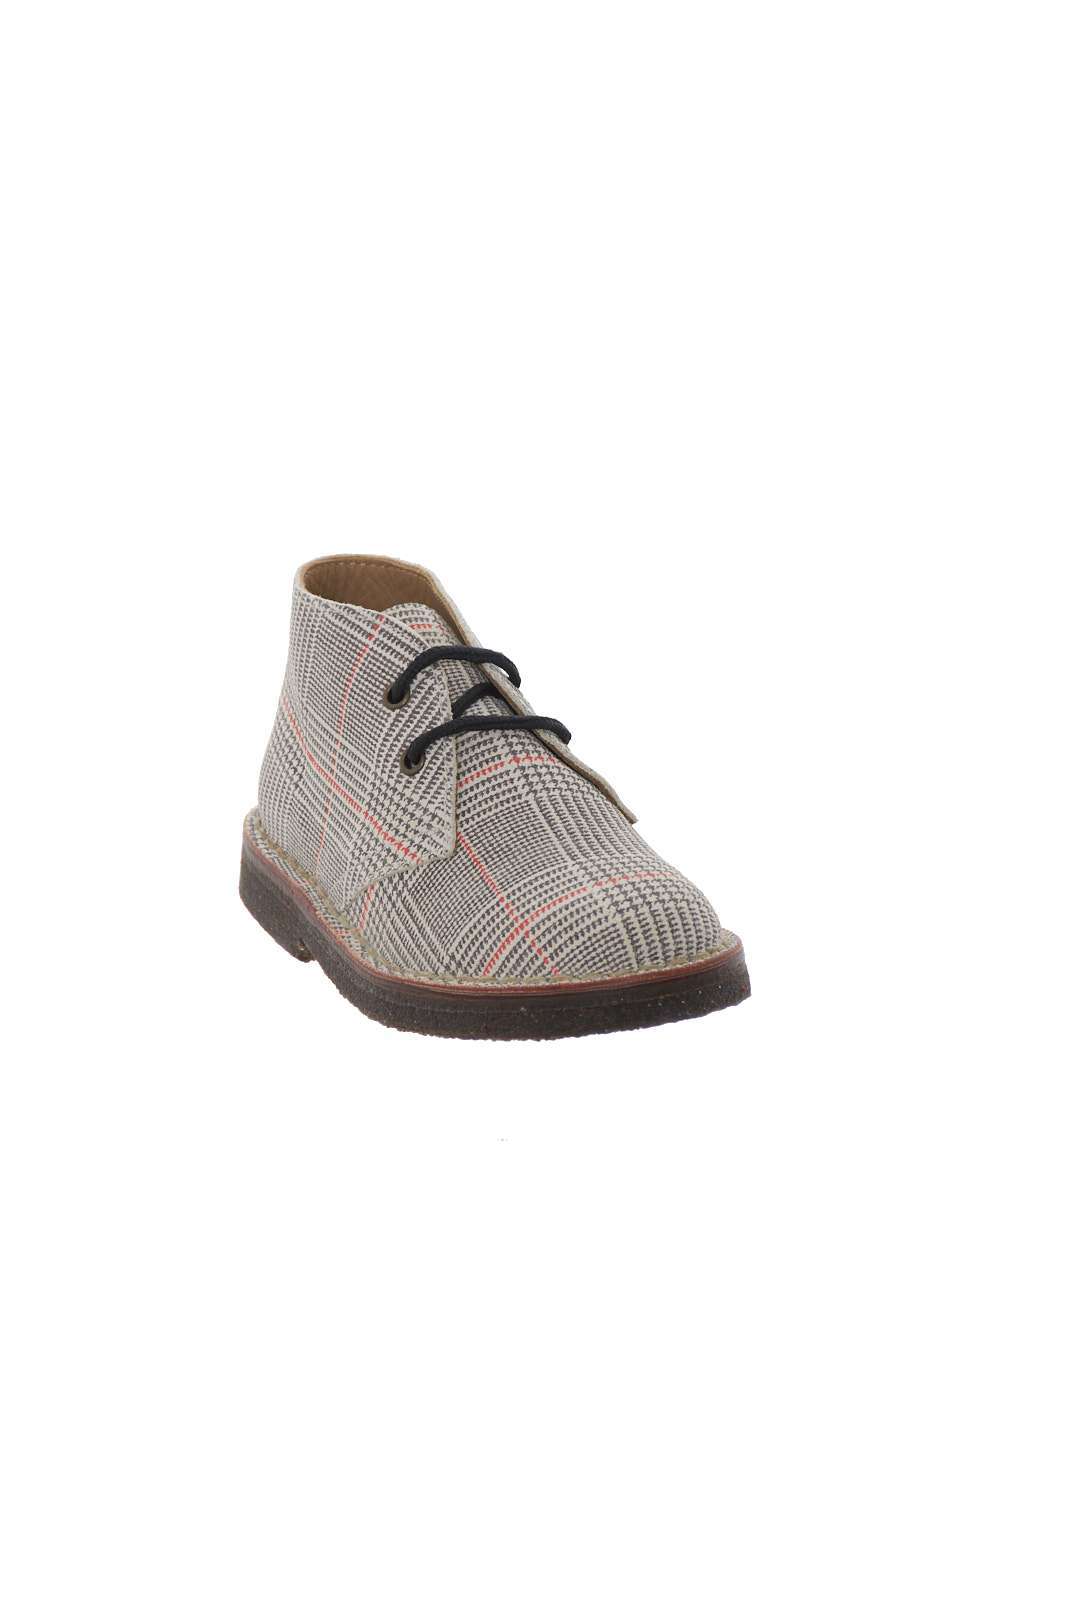 https://www.parmax.com/media/catalog/product/P/E/PE-outlet_parmax-scarpa-bambino-P_P_-01016-C.jpg